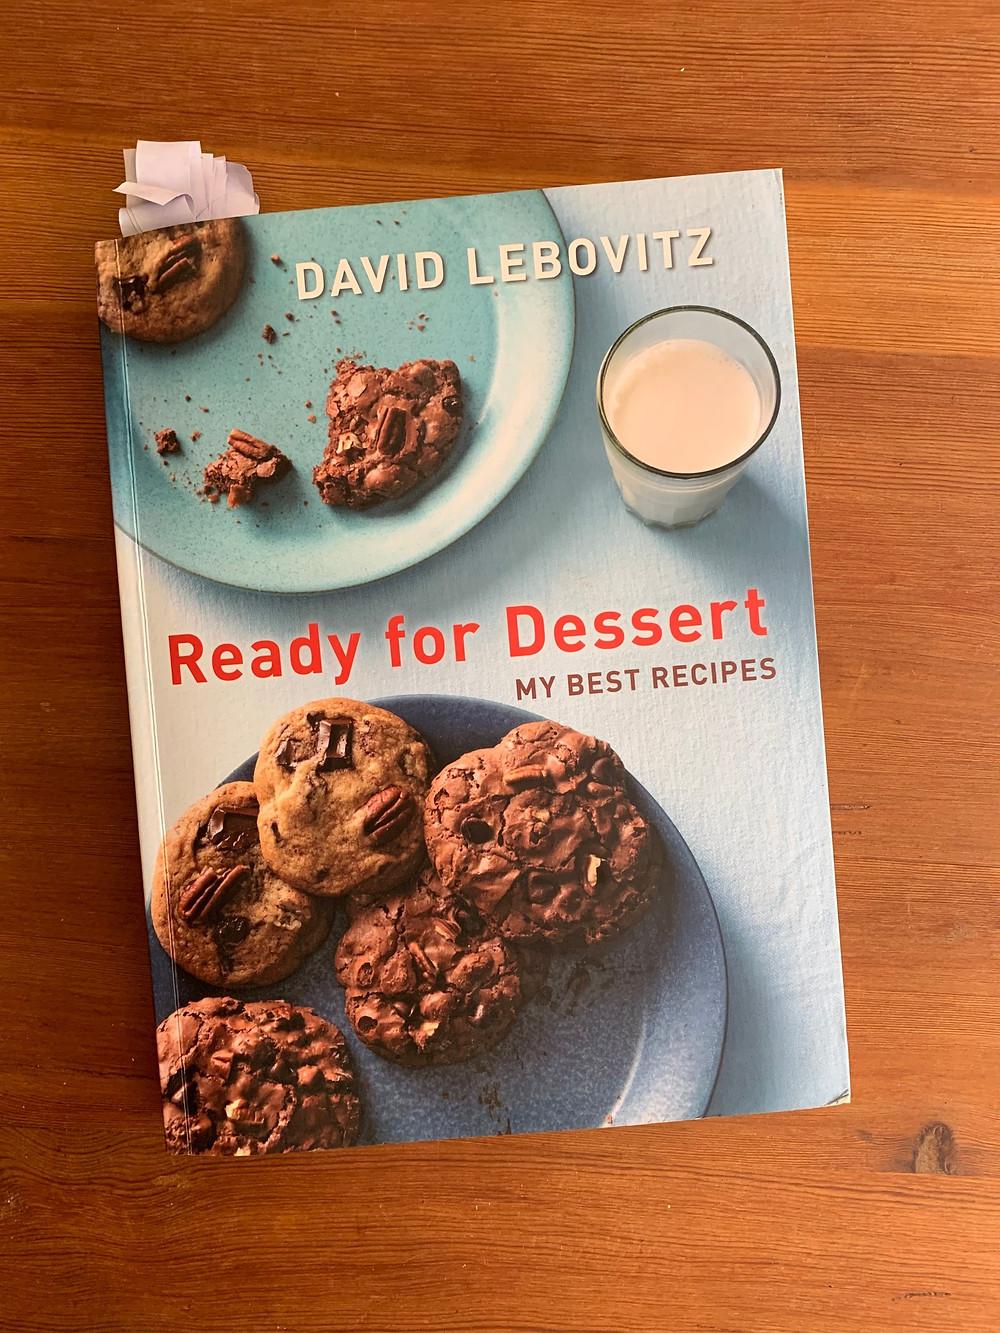 David Lebovitz - Ready for Dessert